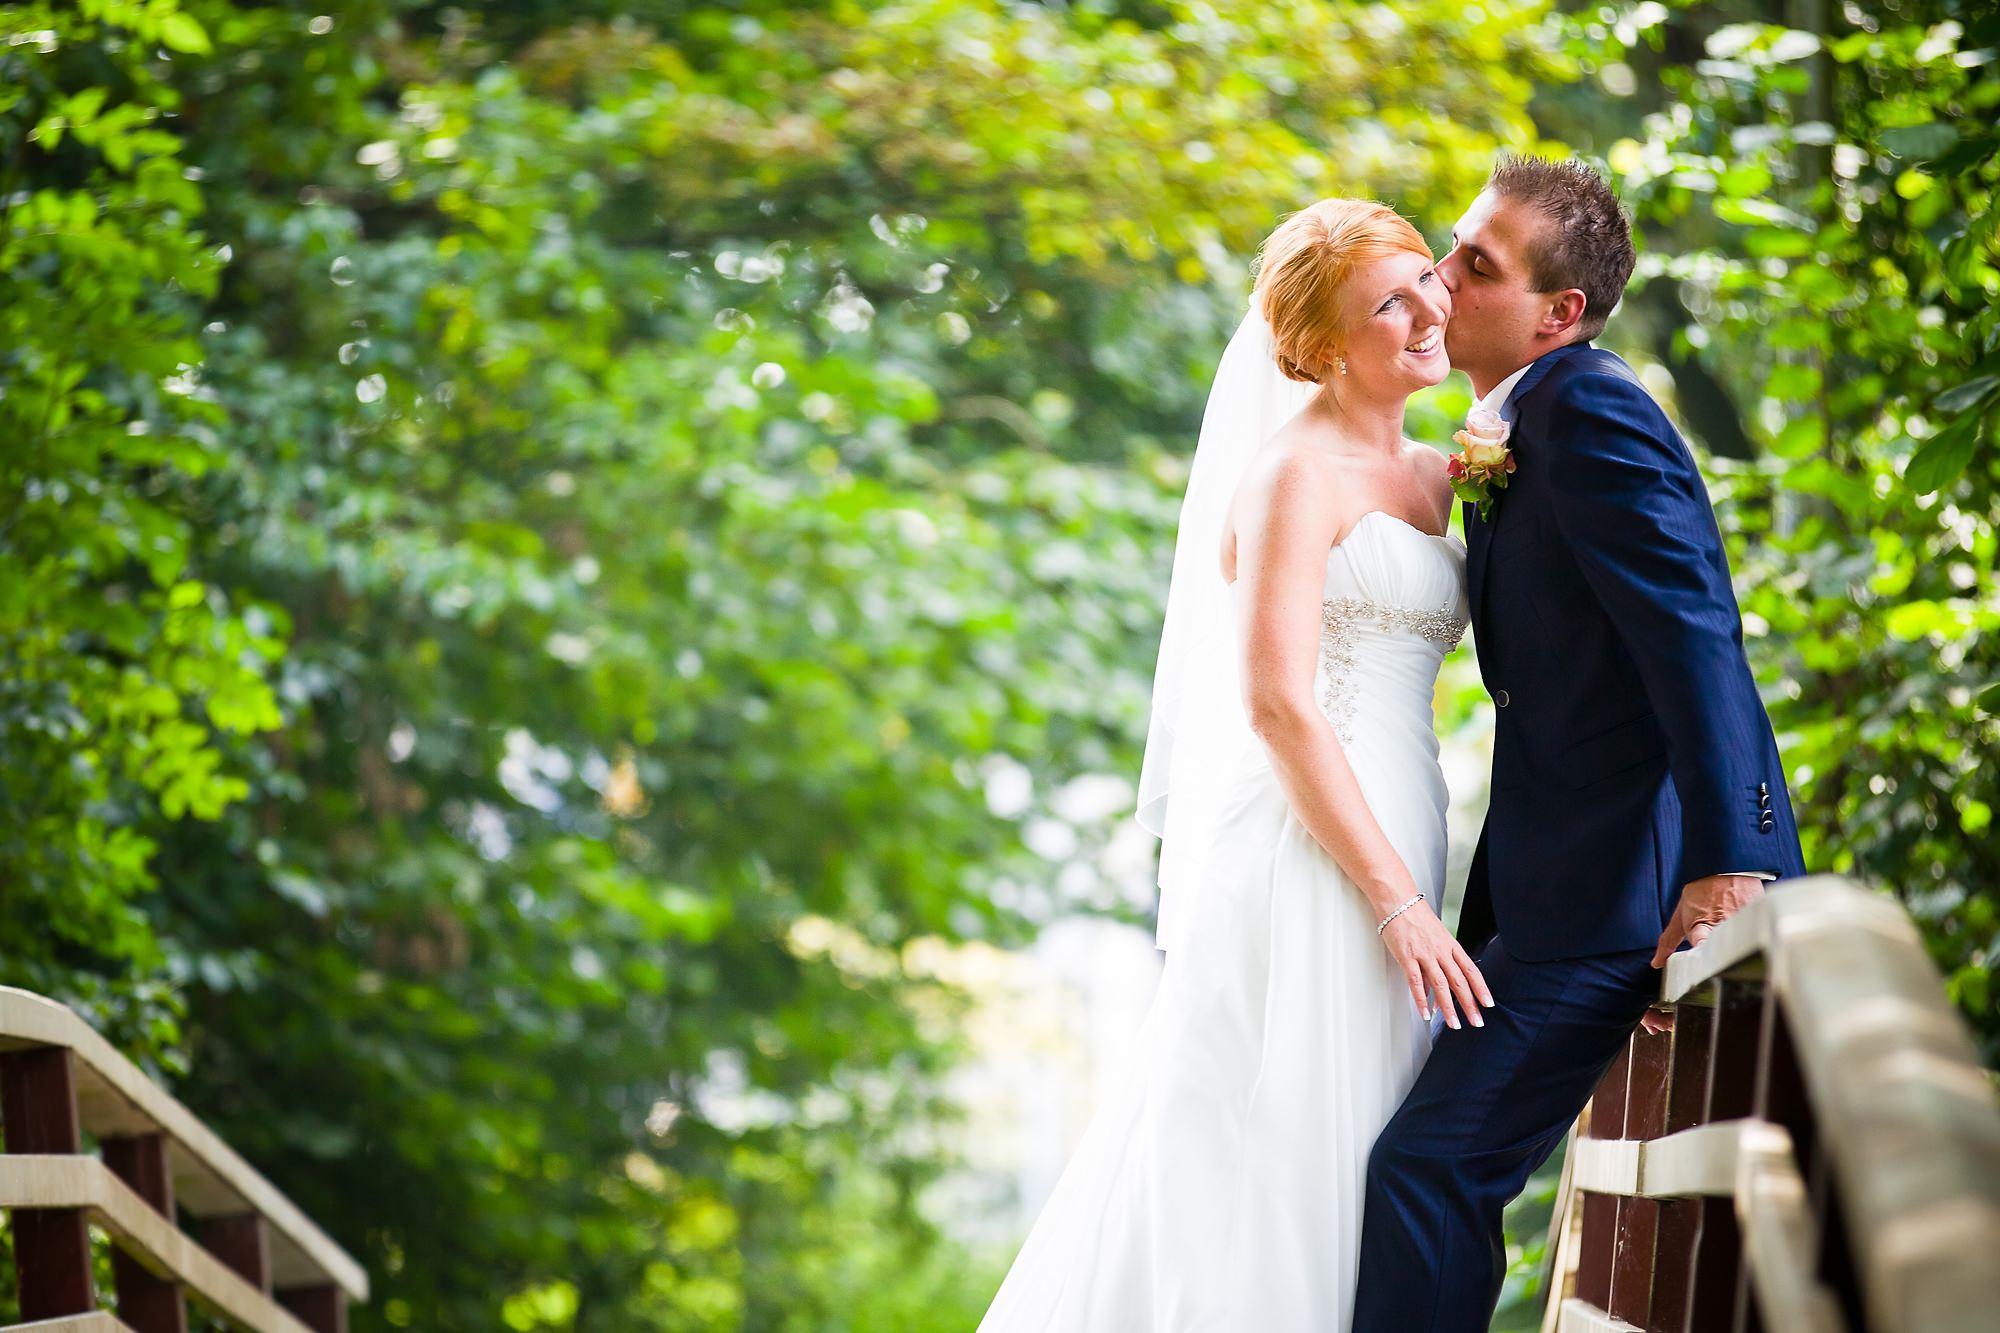 trouwshoot-bruidsfotografie-trouwfoto-feestfotografie-trouwreportage-Jorike en Sebastiaan606.jpg